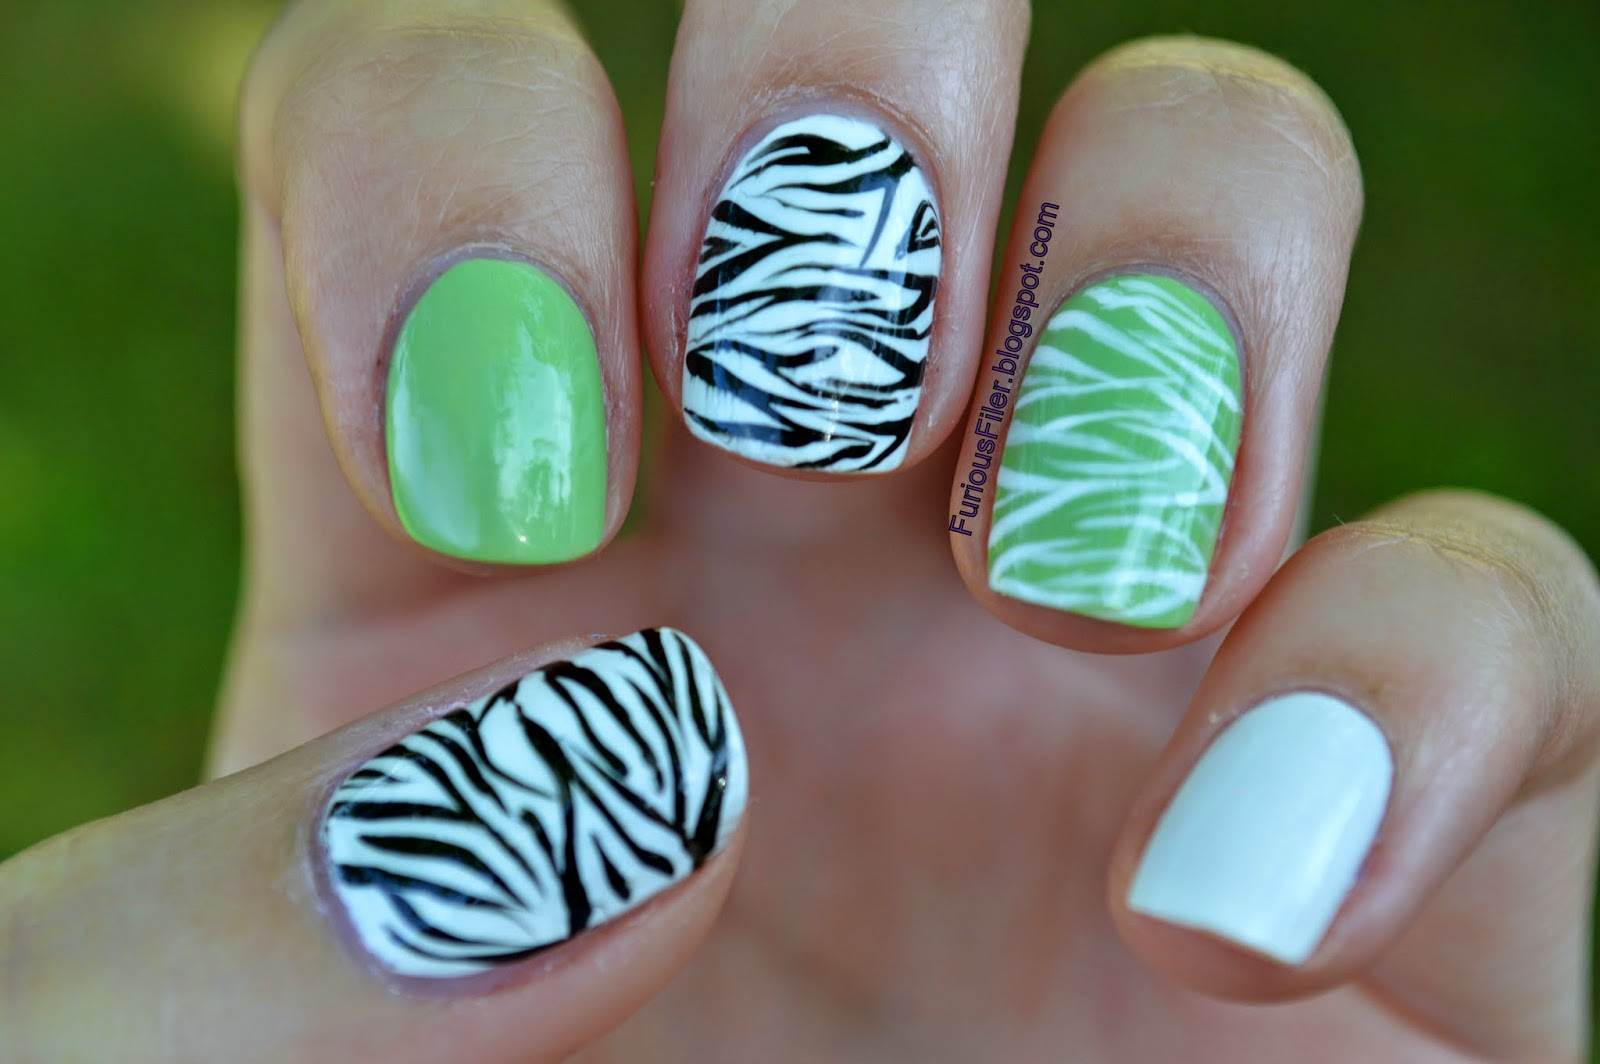 green and black zebra nail art